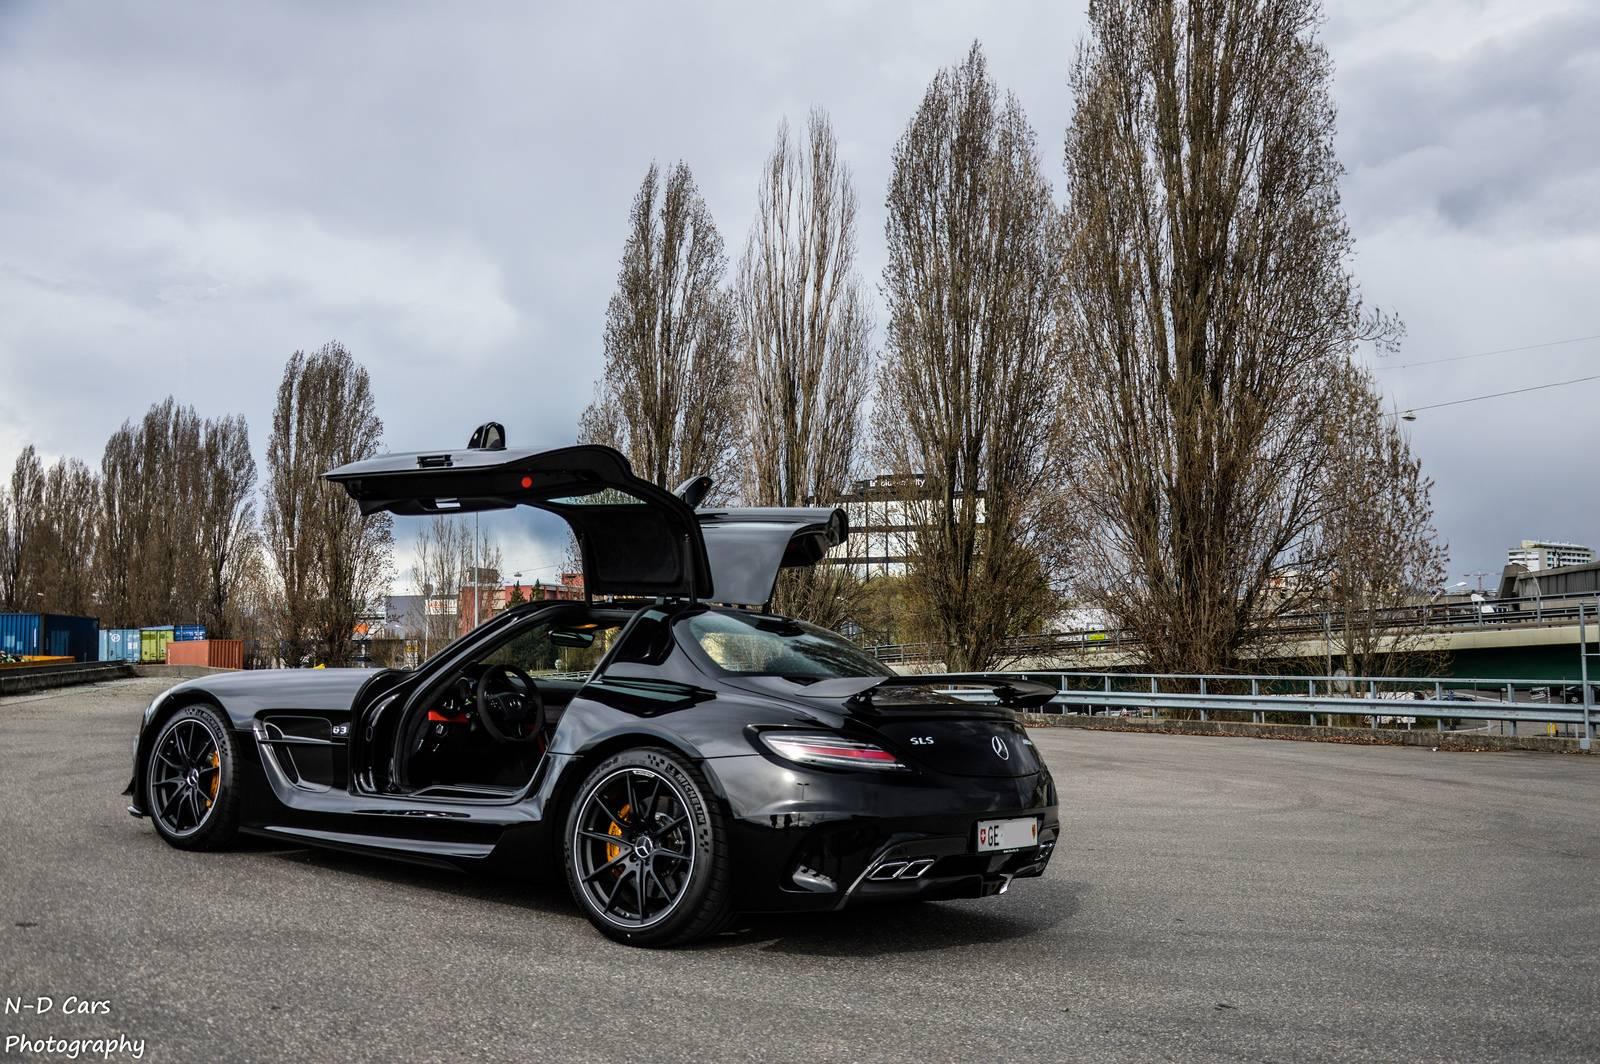 Sls Black Series >> Black Mercedes Benz Sls Amg Black Series Photoshoot Gtspirit